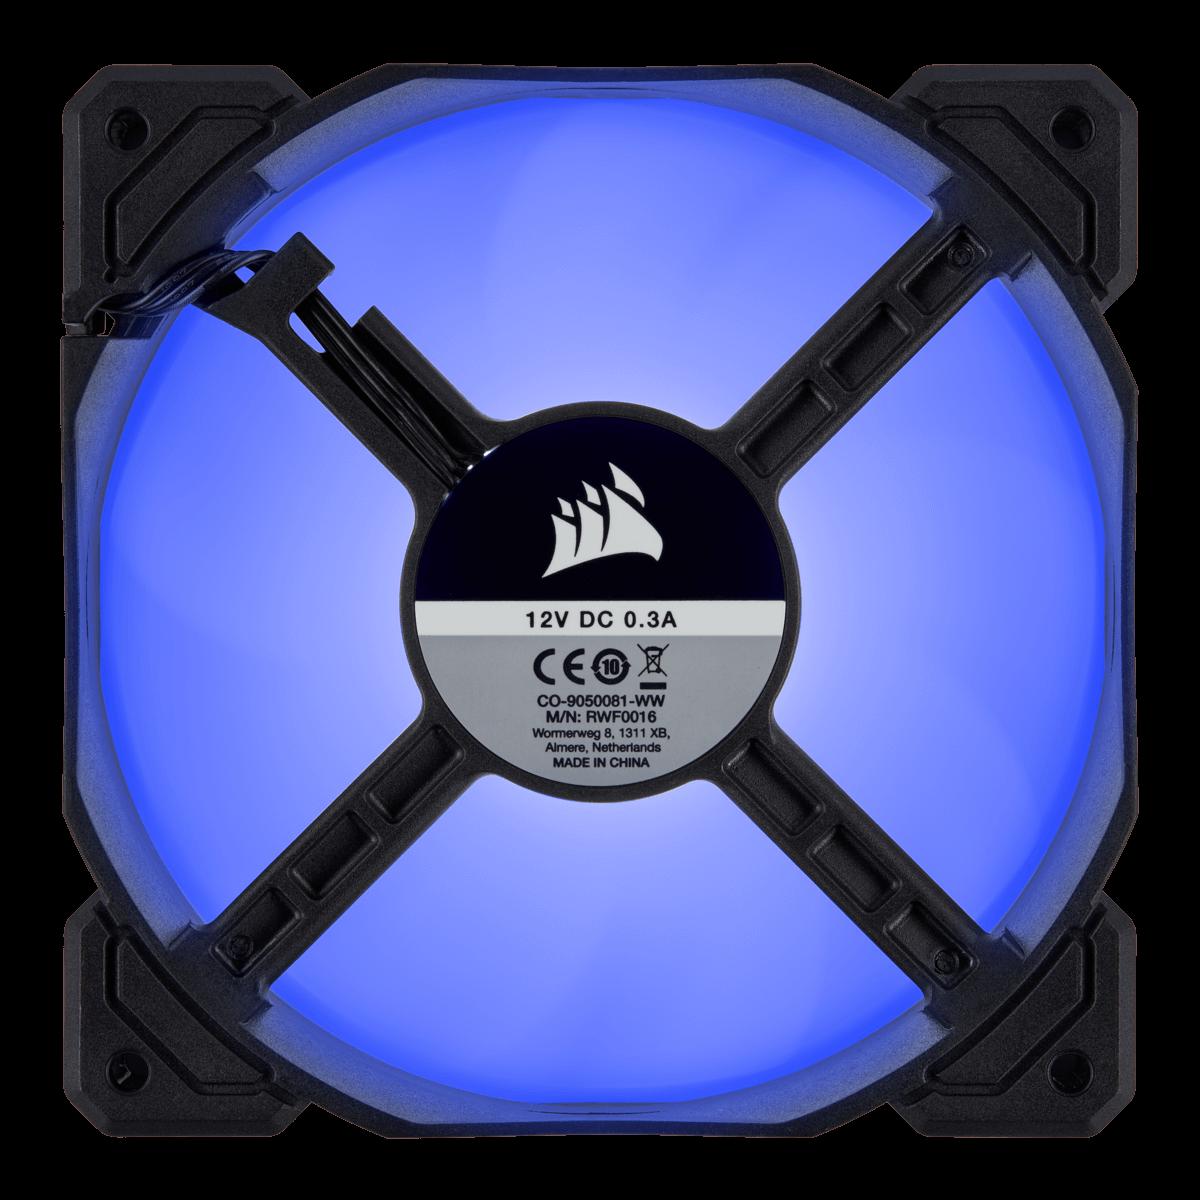 Kit Fan com 3 Unidades Corsair AF120, Led Blue 120mm, CO-9050084-WW